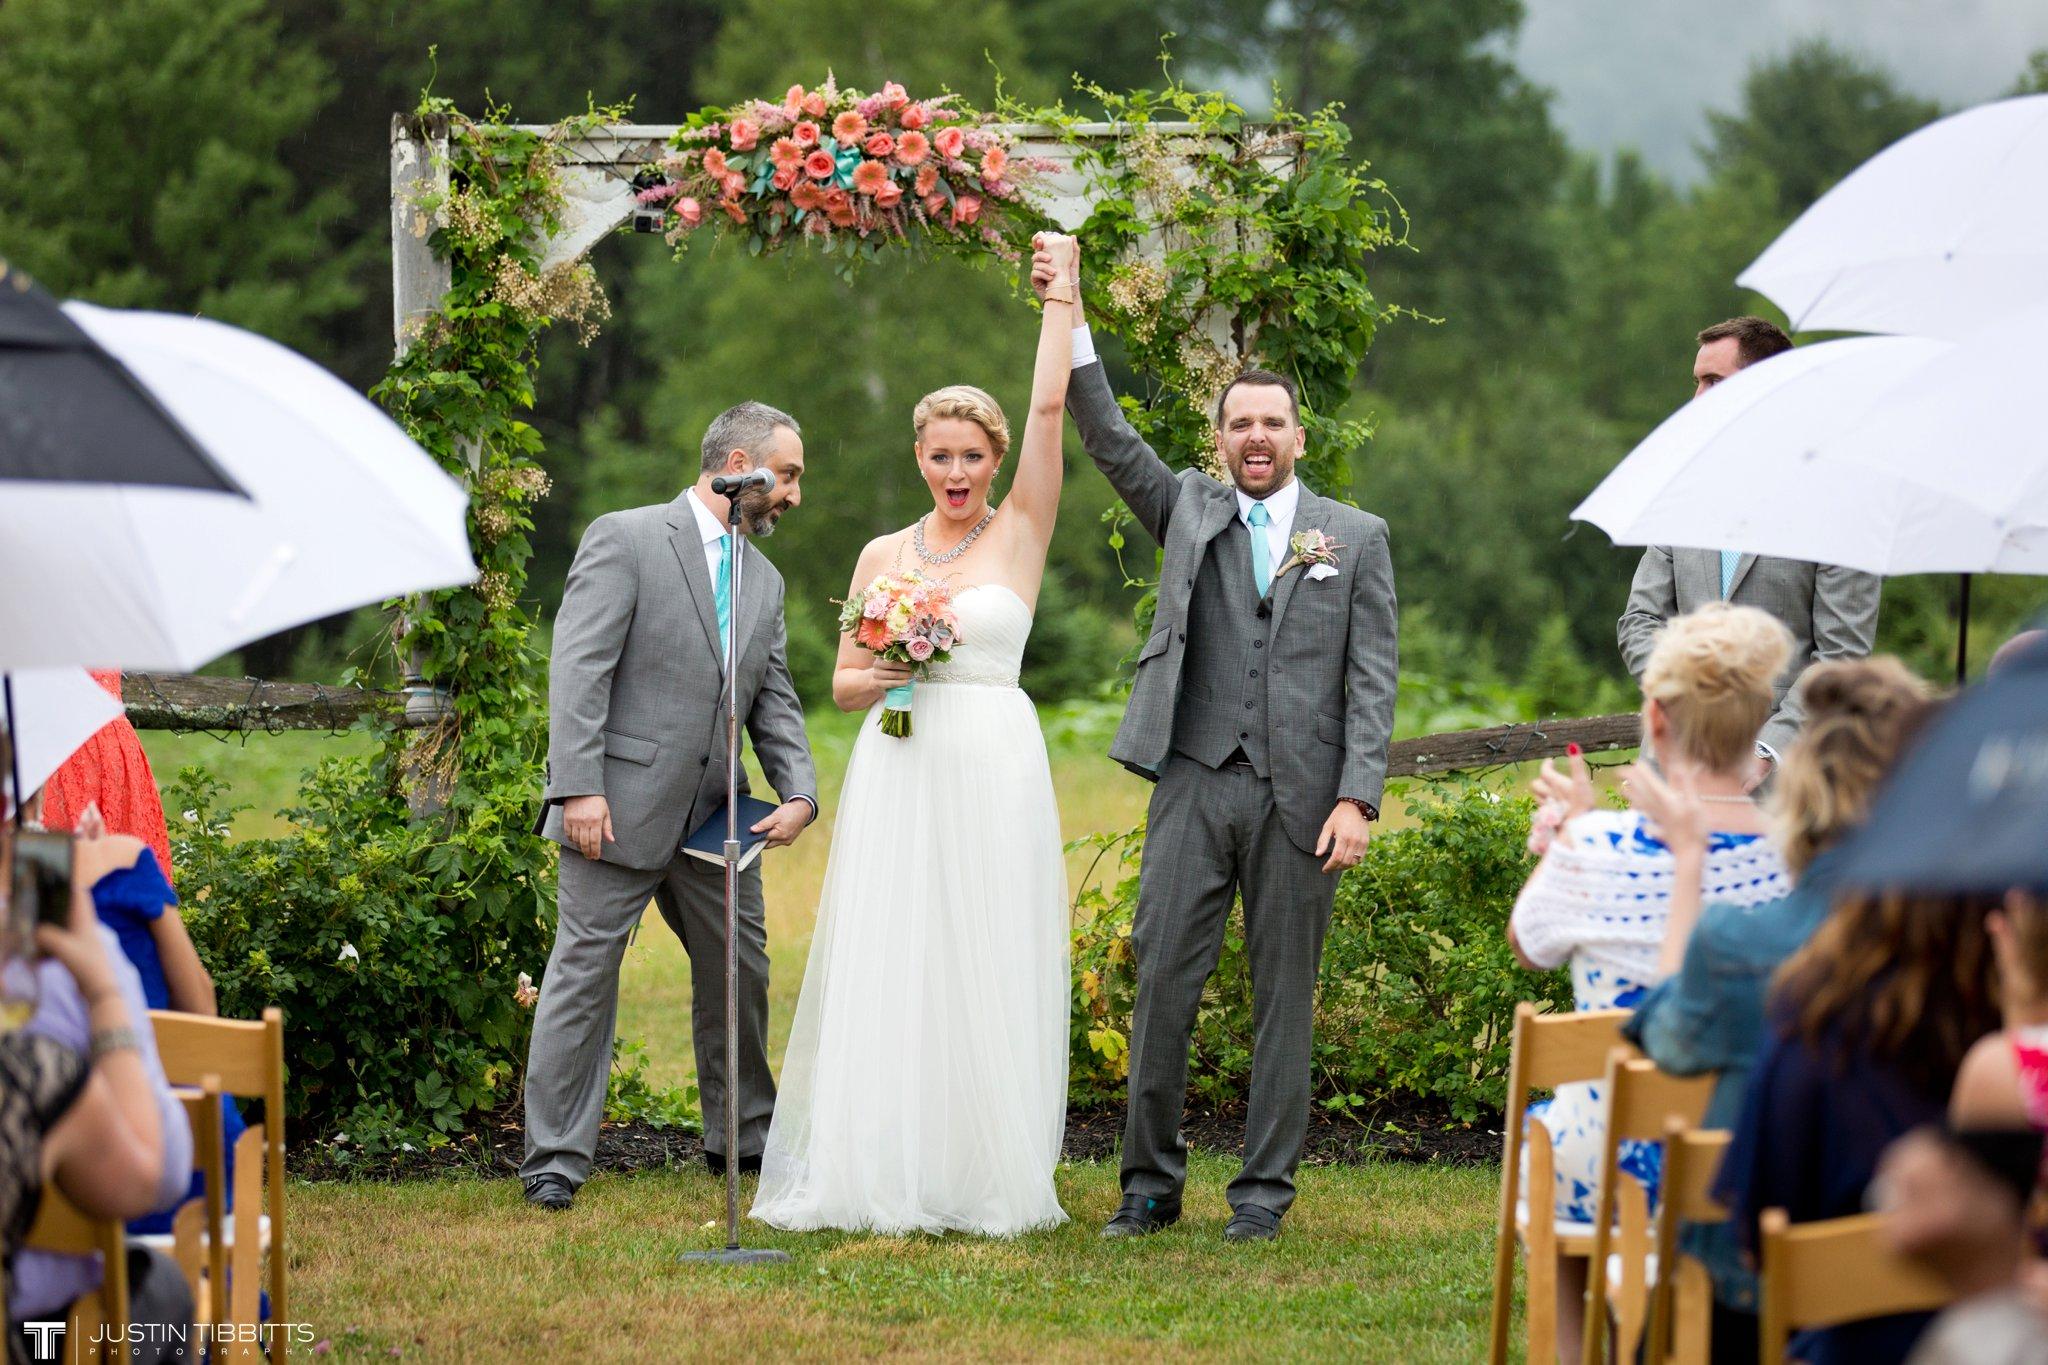 burlap-and-beams-wedding-photos-with-joran-and-molly_0073